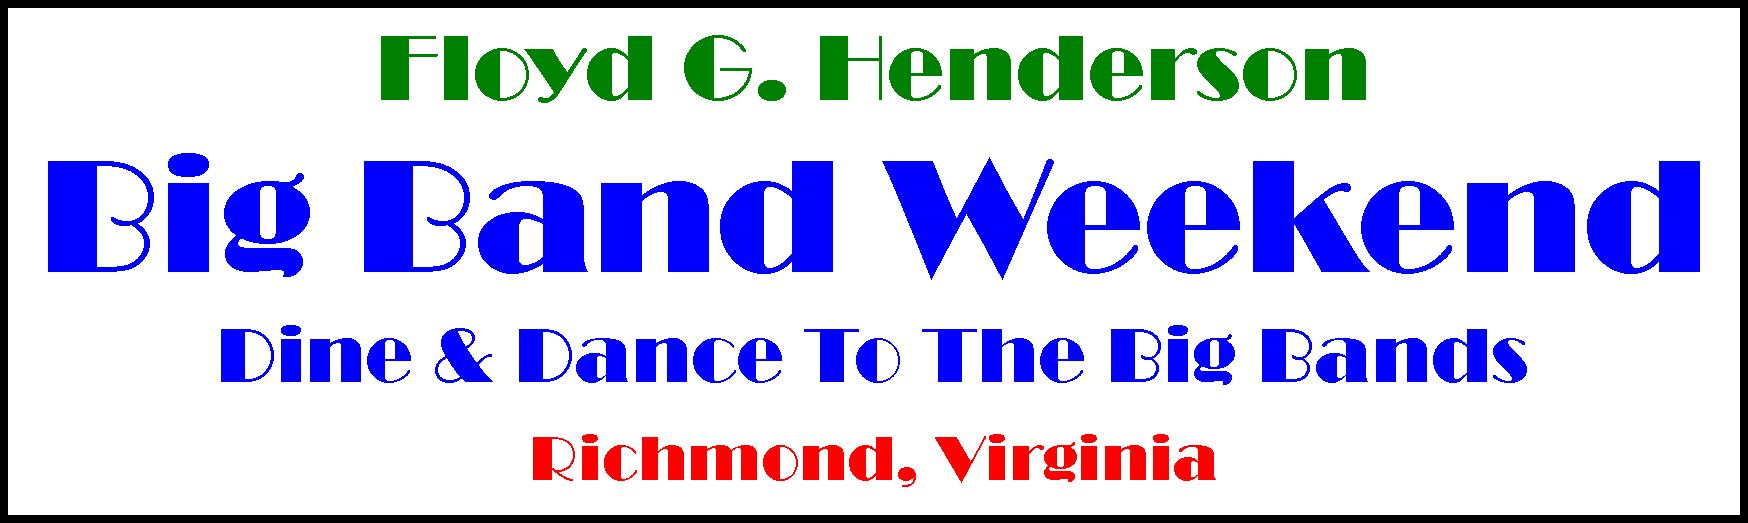 Richmond, Virginia RVA Big Band Swing Weekend 2022